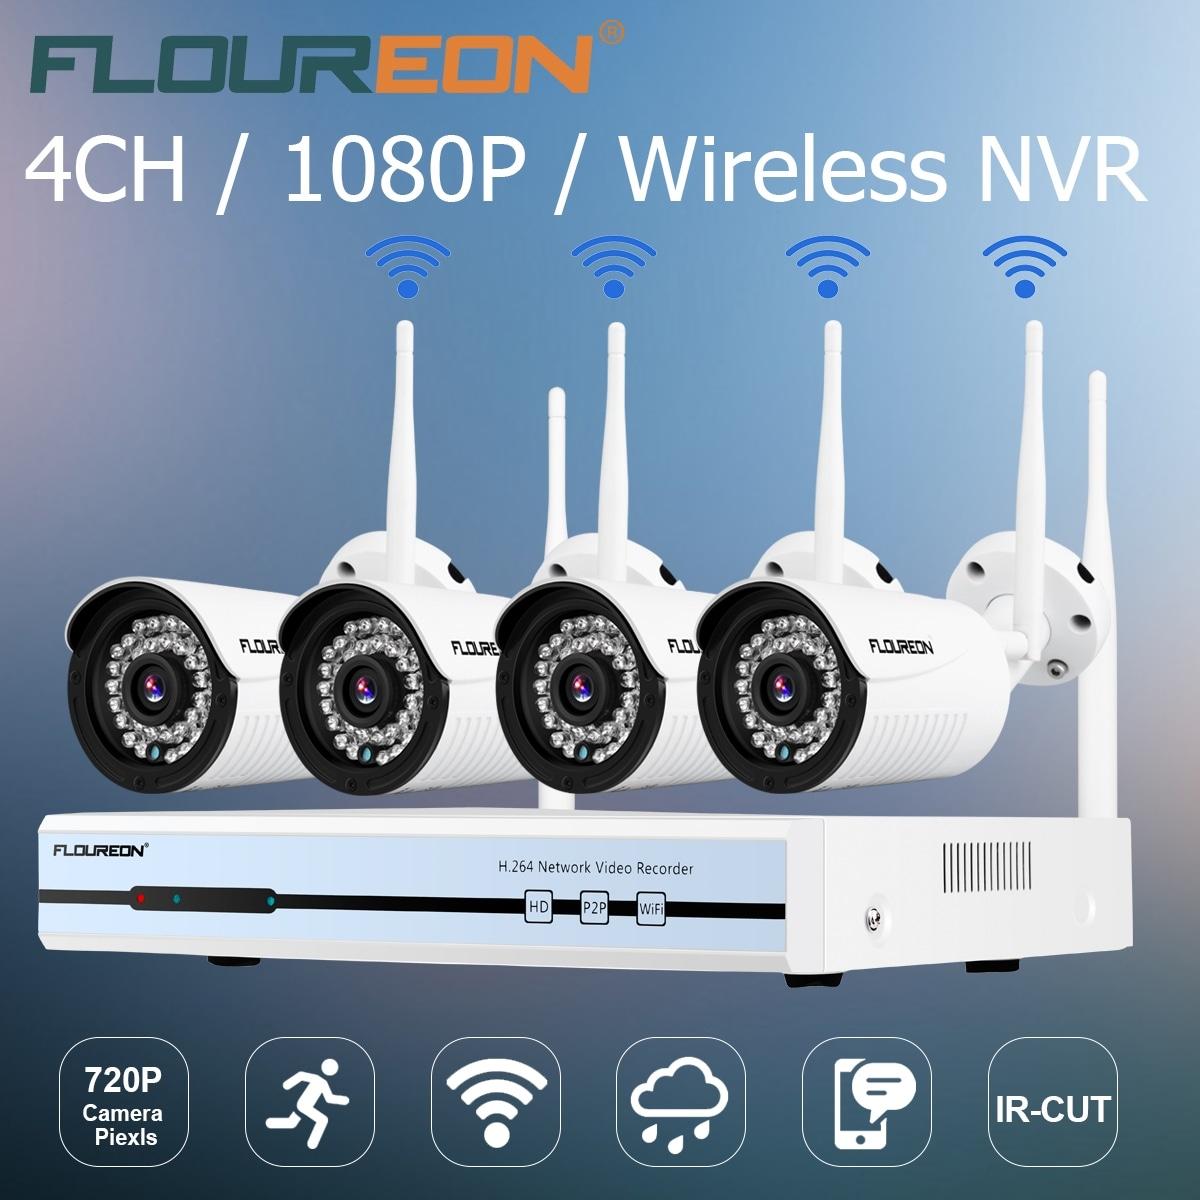 Floureon 4CH Wireless CCTV 1080P DVR Kit Outdoor Wifi WLAN 720P IP Camera  Security Video Recorder NVR System